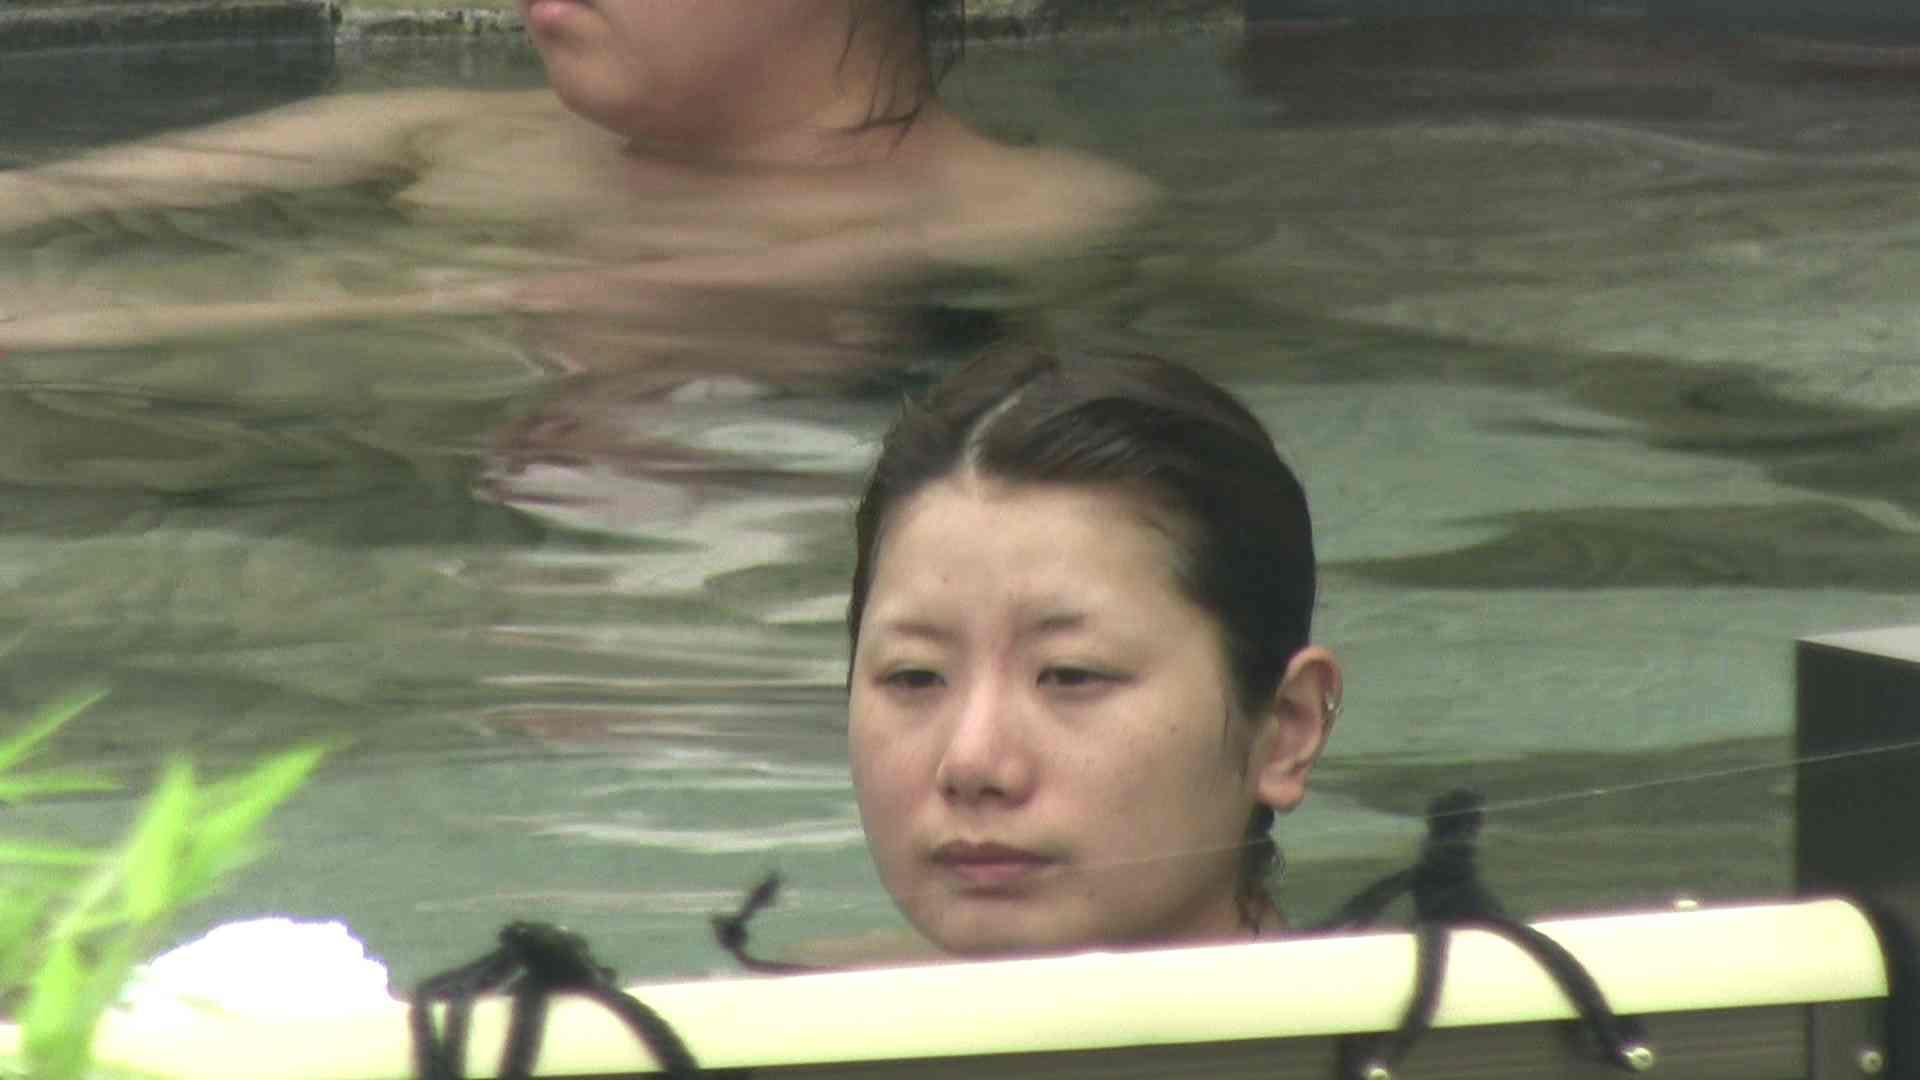 Aquaな露天風呂Vol.19【VIP】 盗撮 | HなOL  88pic 72